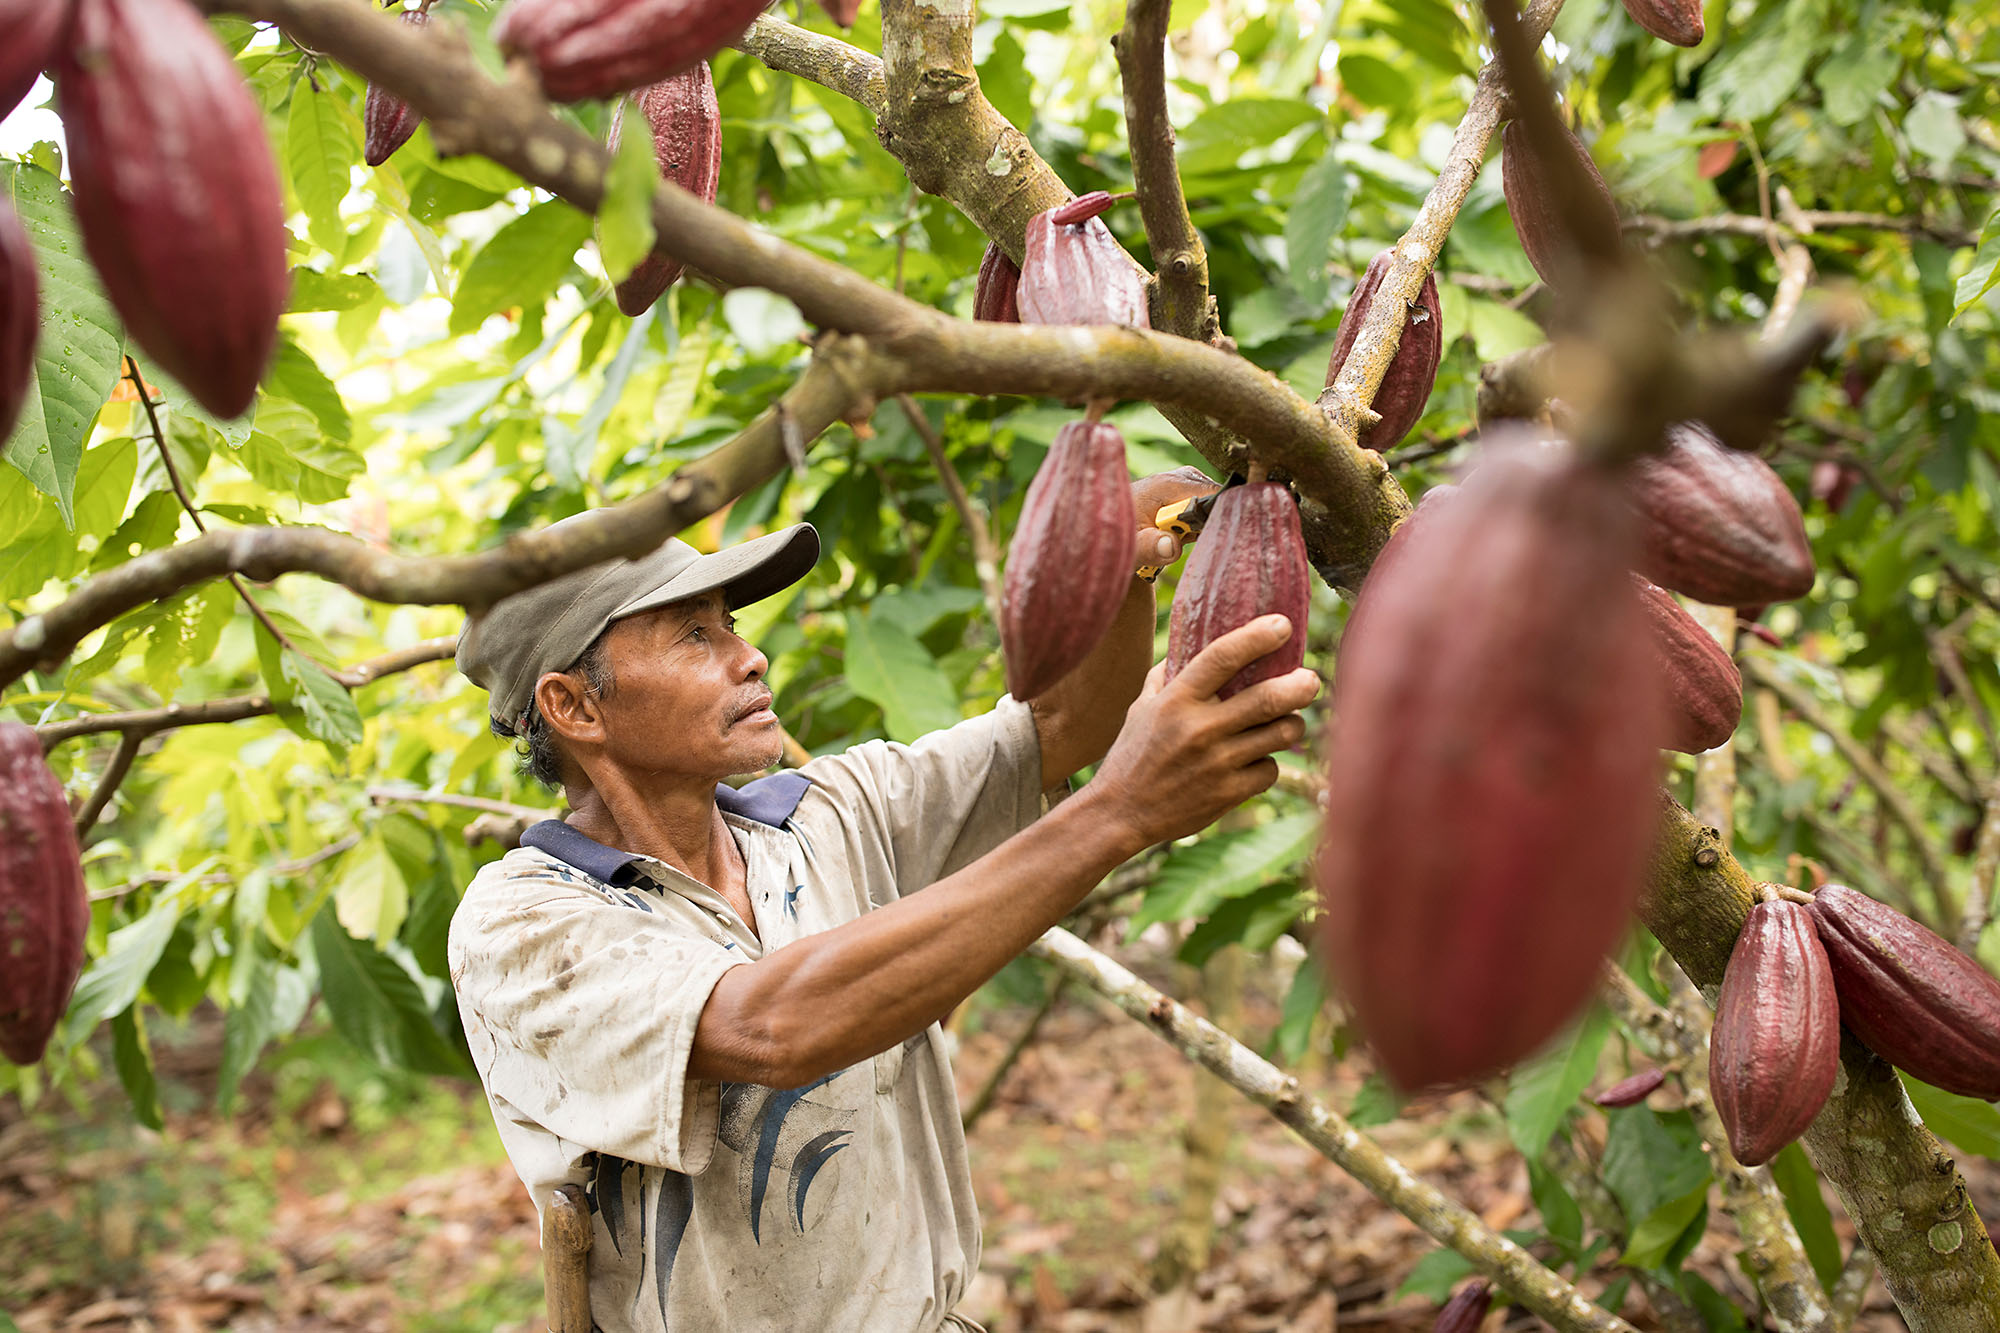 Siding (56) harvests cocoa on a farm in Mamuju Regency, Indonesia.